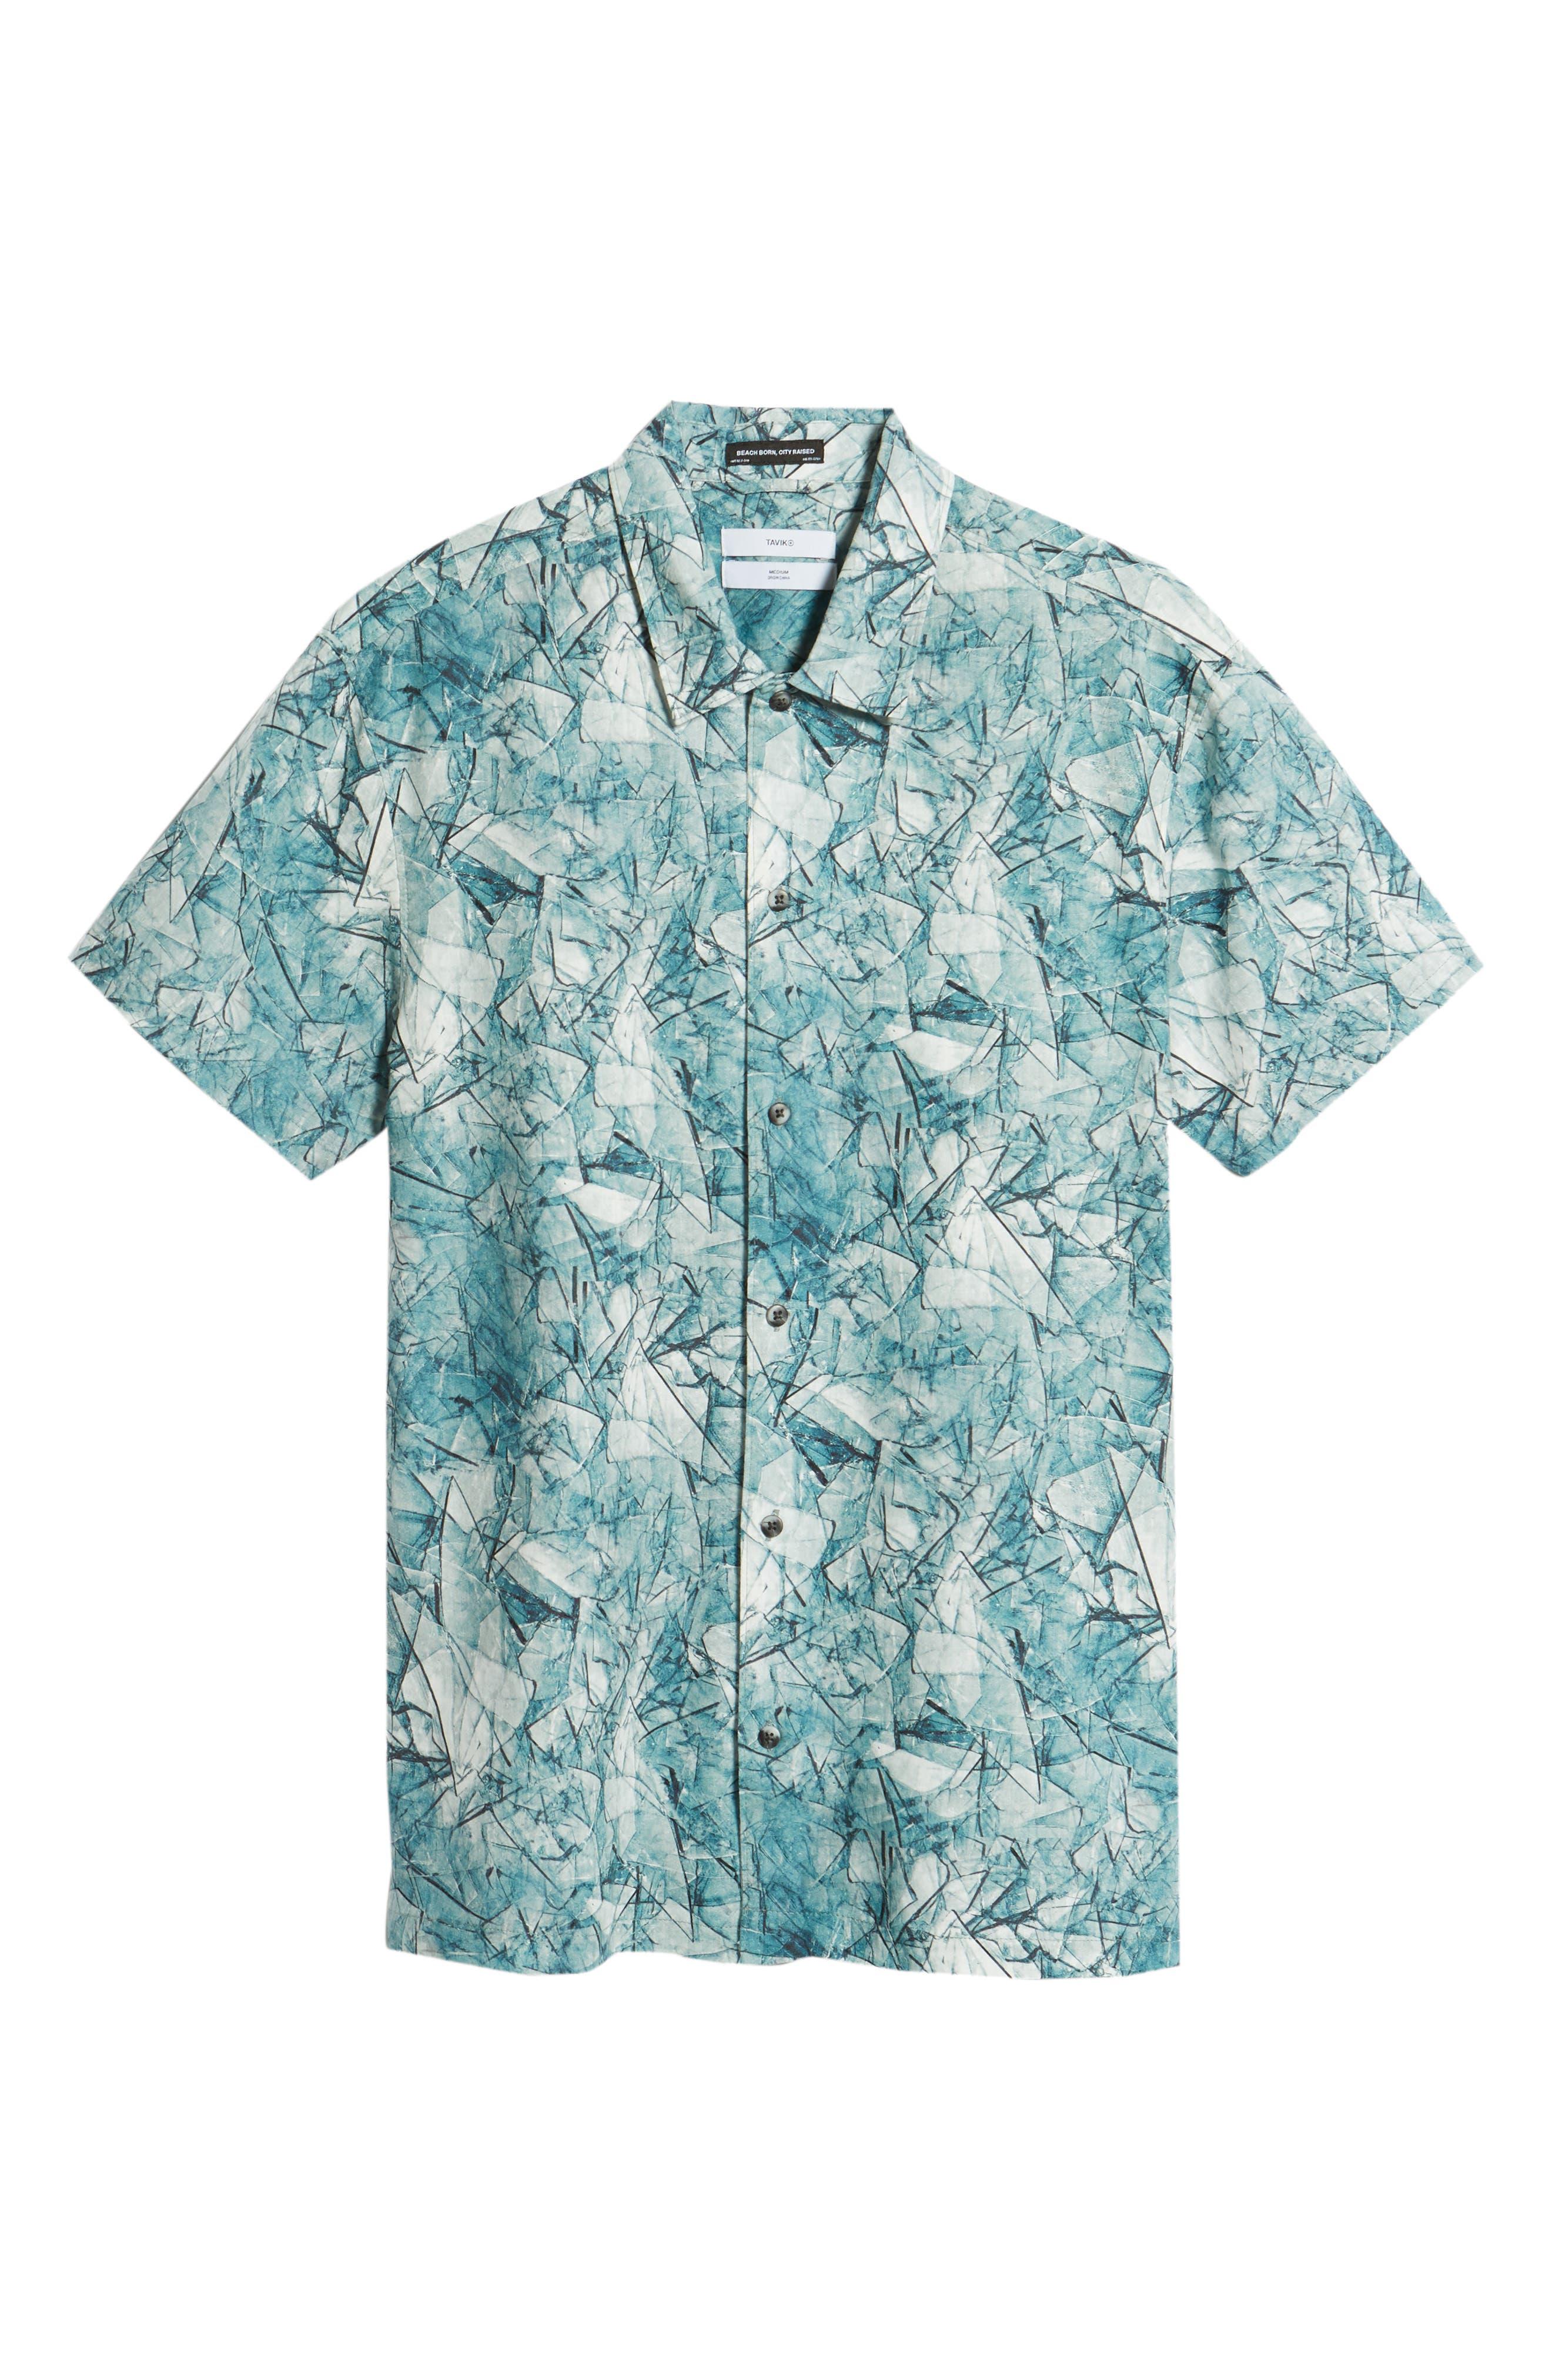 Shoto Short Sleeve Shirt,                             Alternate thumbnail 6, color,                             SHATTERED BLUE